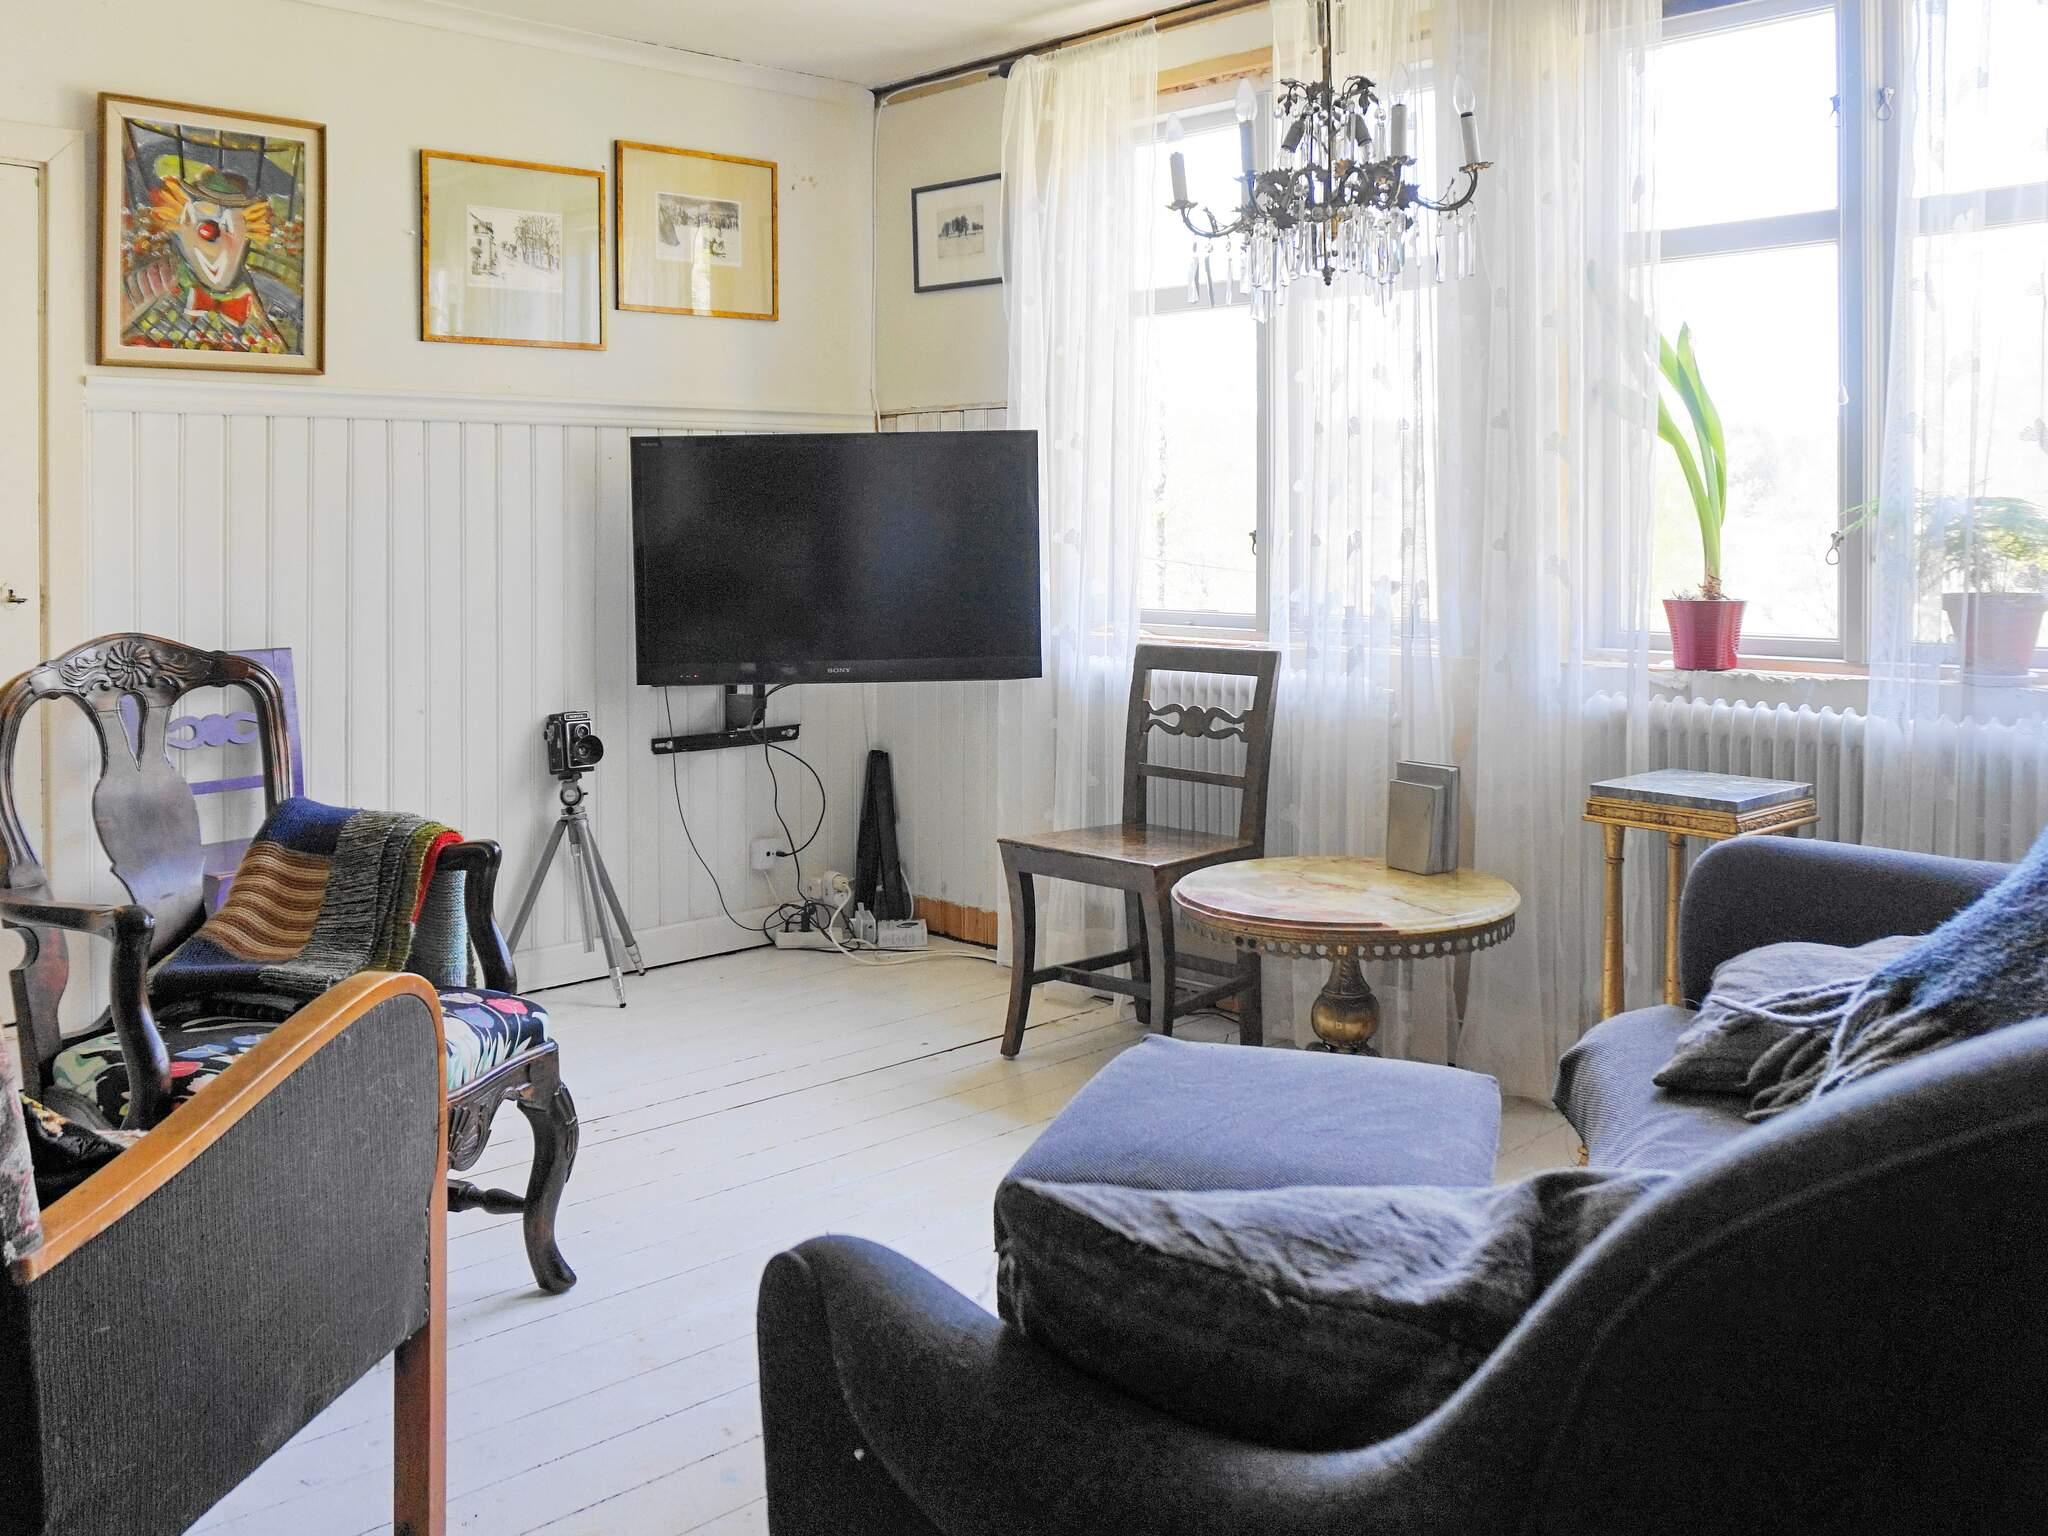 Ferienhaus Orust/Varekil (2621199), Varekil, Västra Götaland län, Westschweden, Schweden, Bild 12